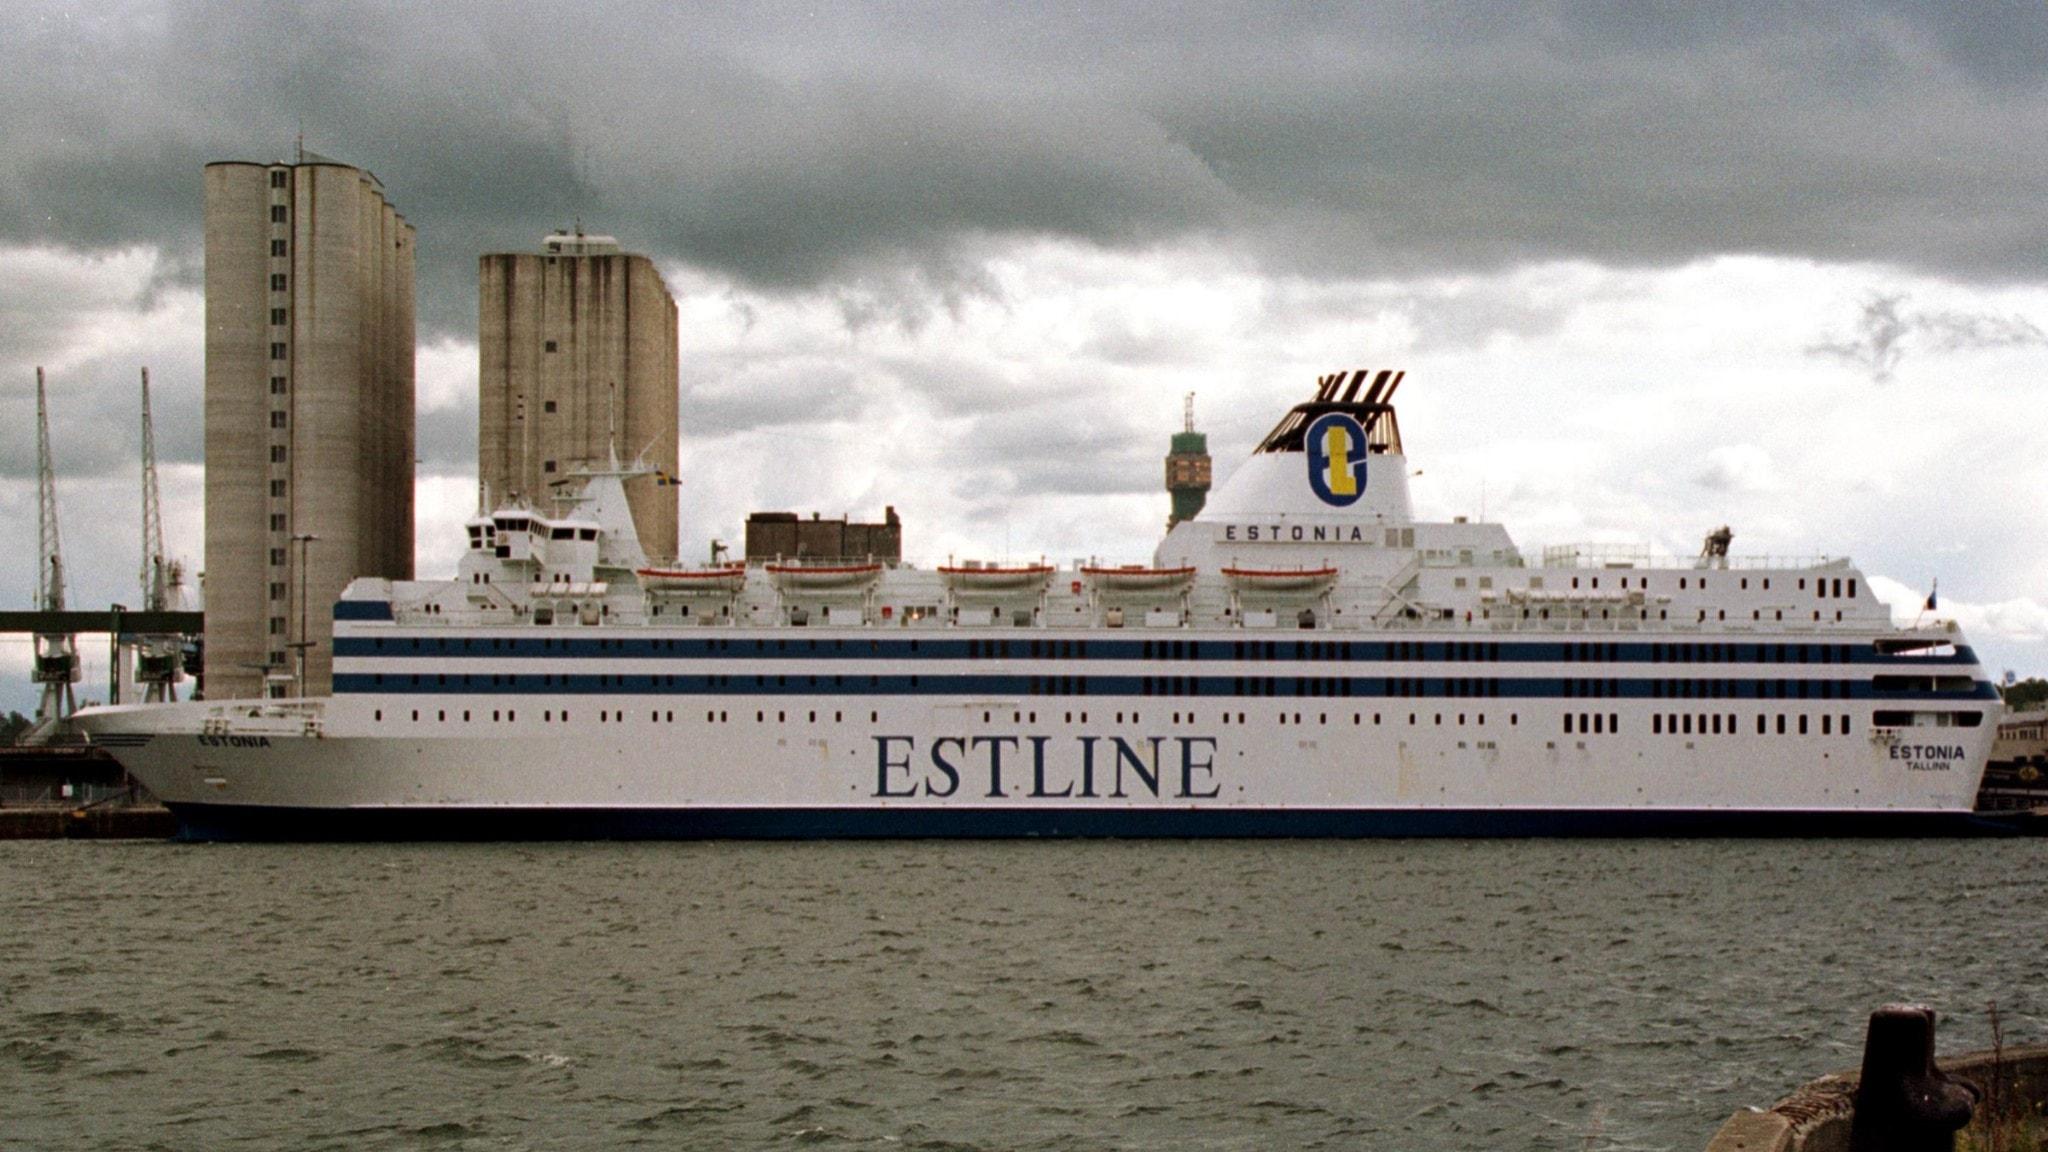 Hur minns du Estoniakatastrofen?